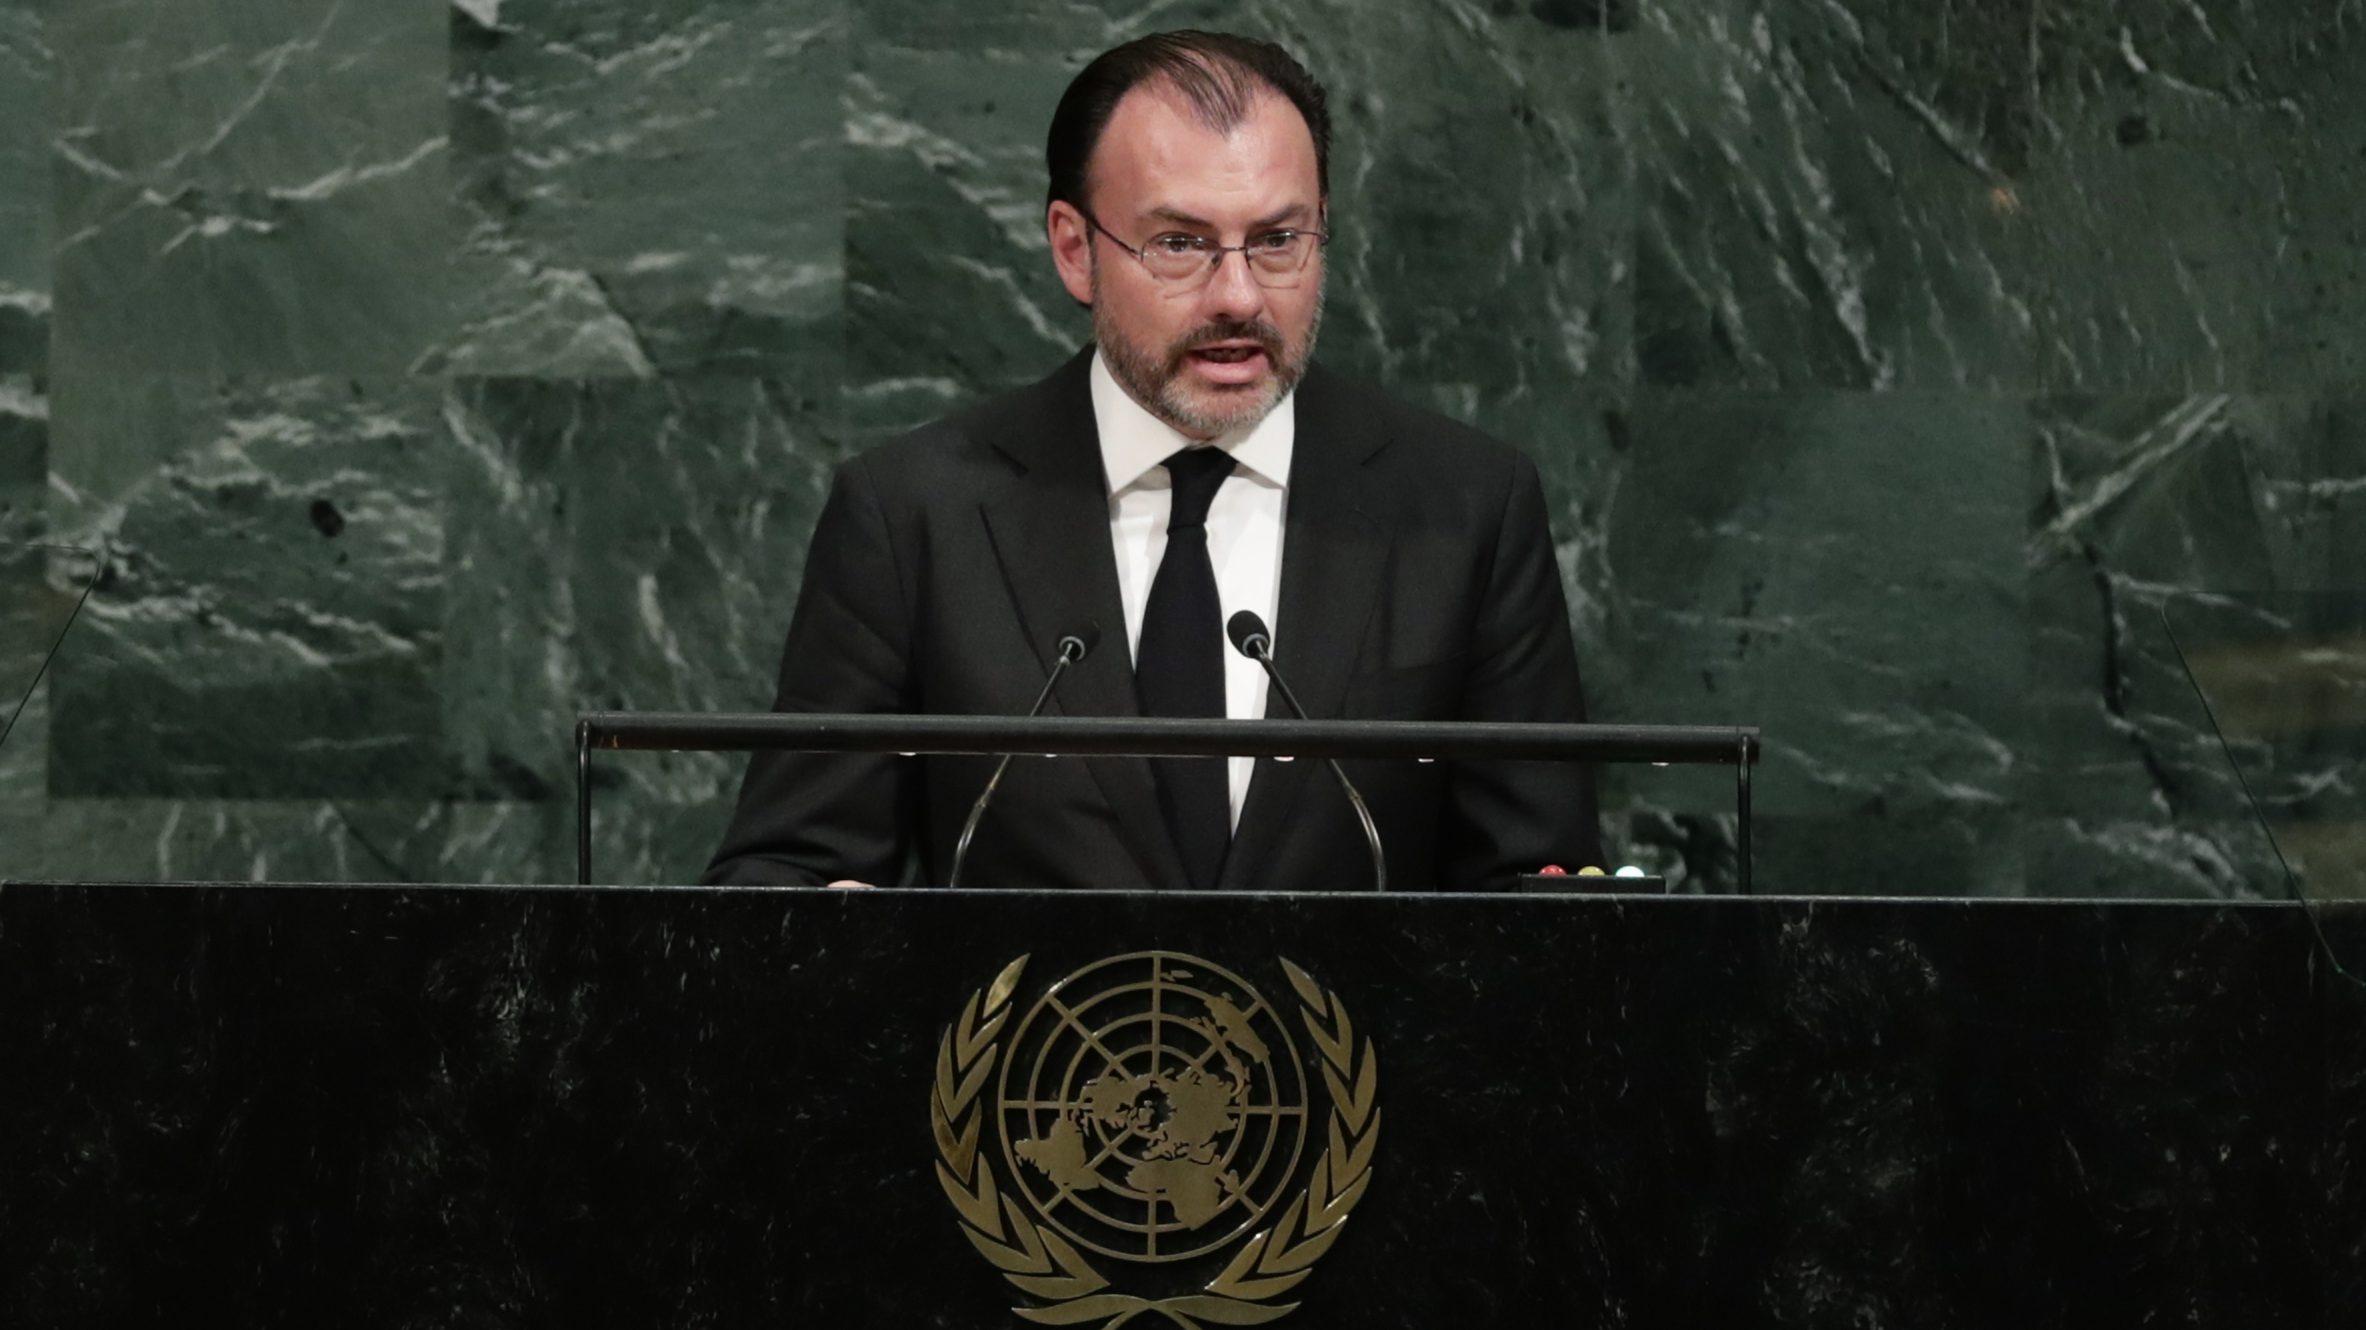 Former finance minister Videgaray was bullish about the economy.